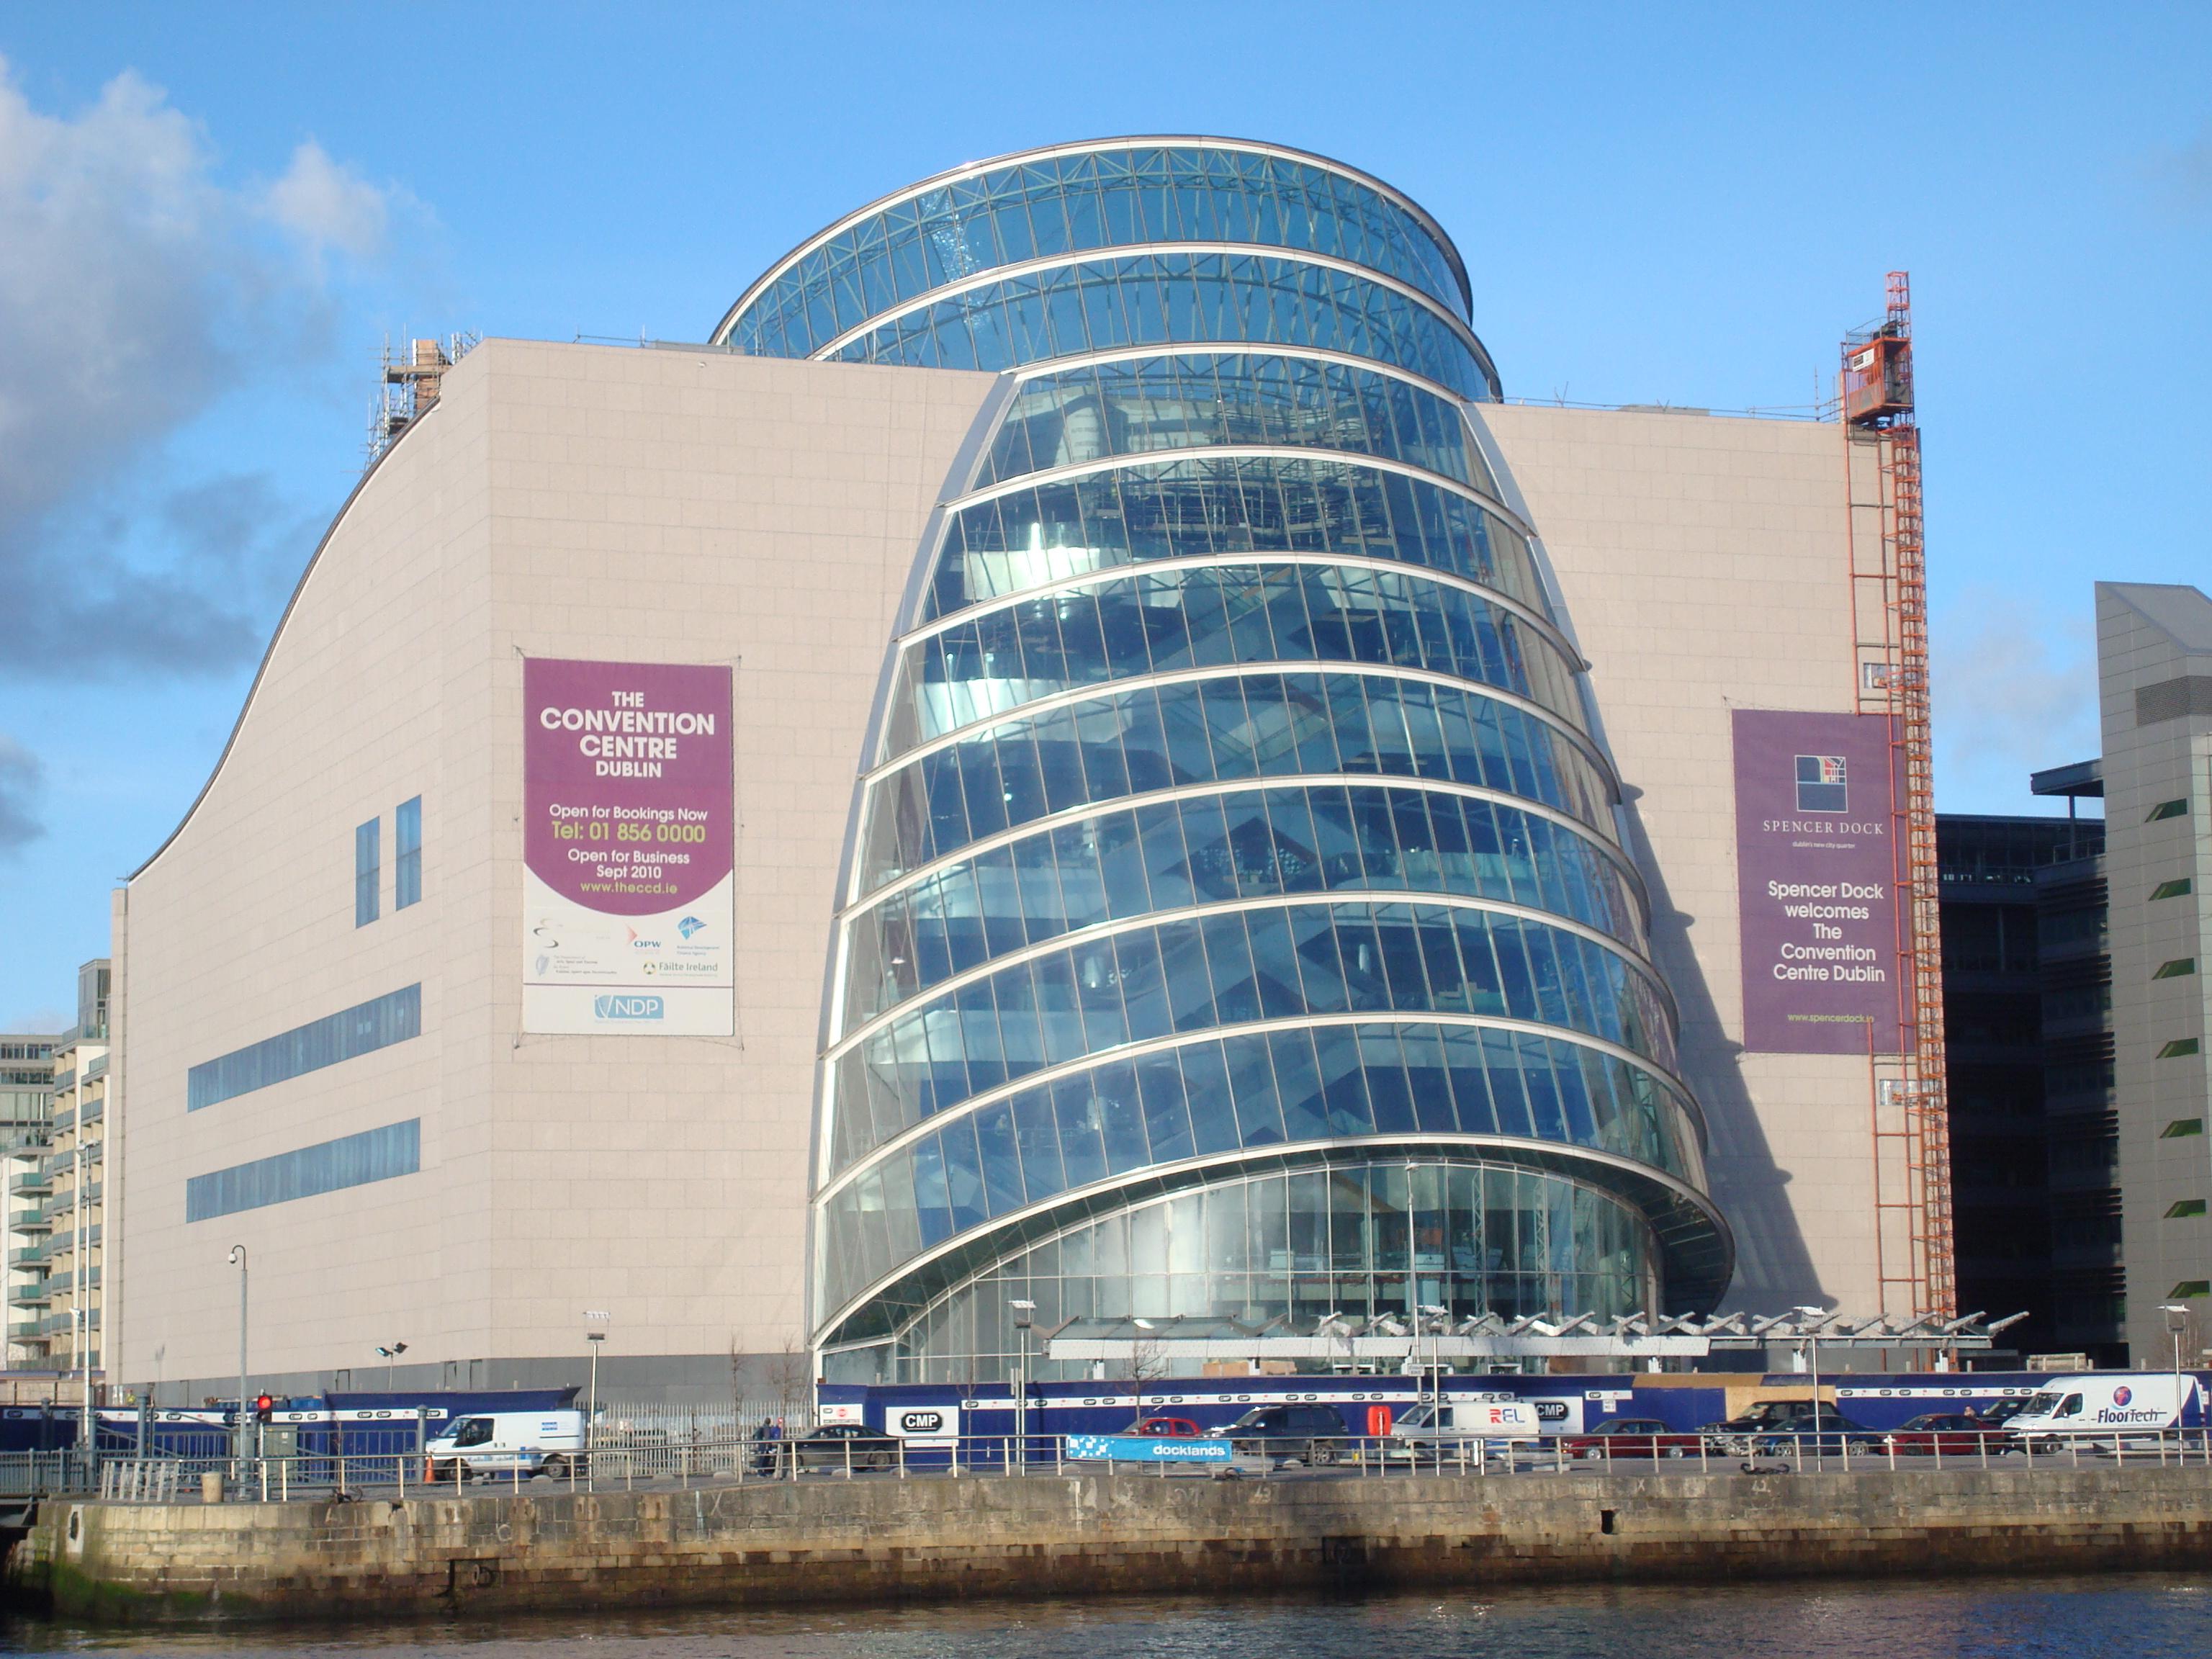 Convention_Centre_Dublin.JPG